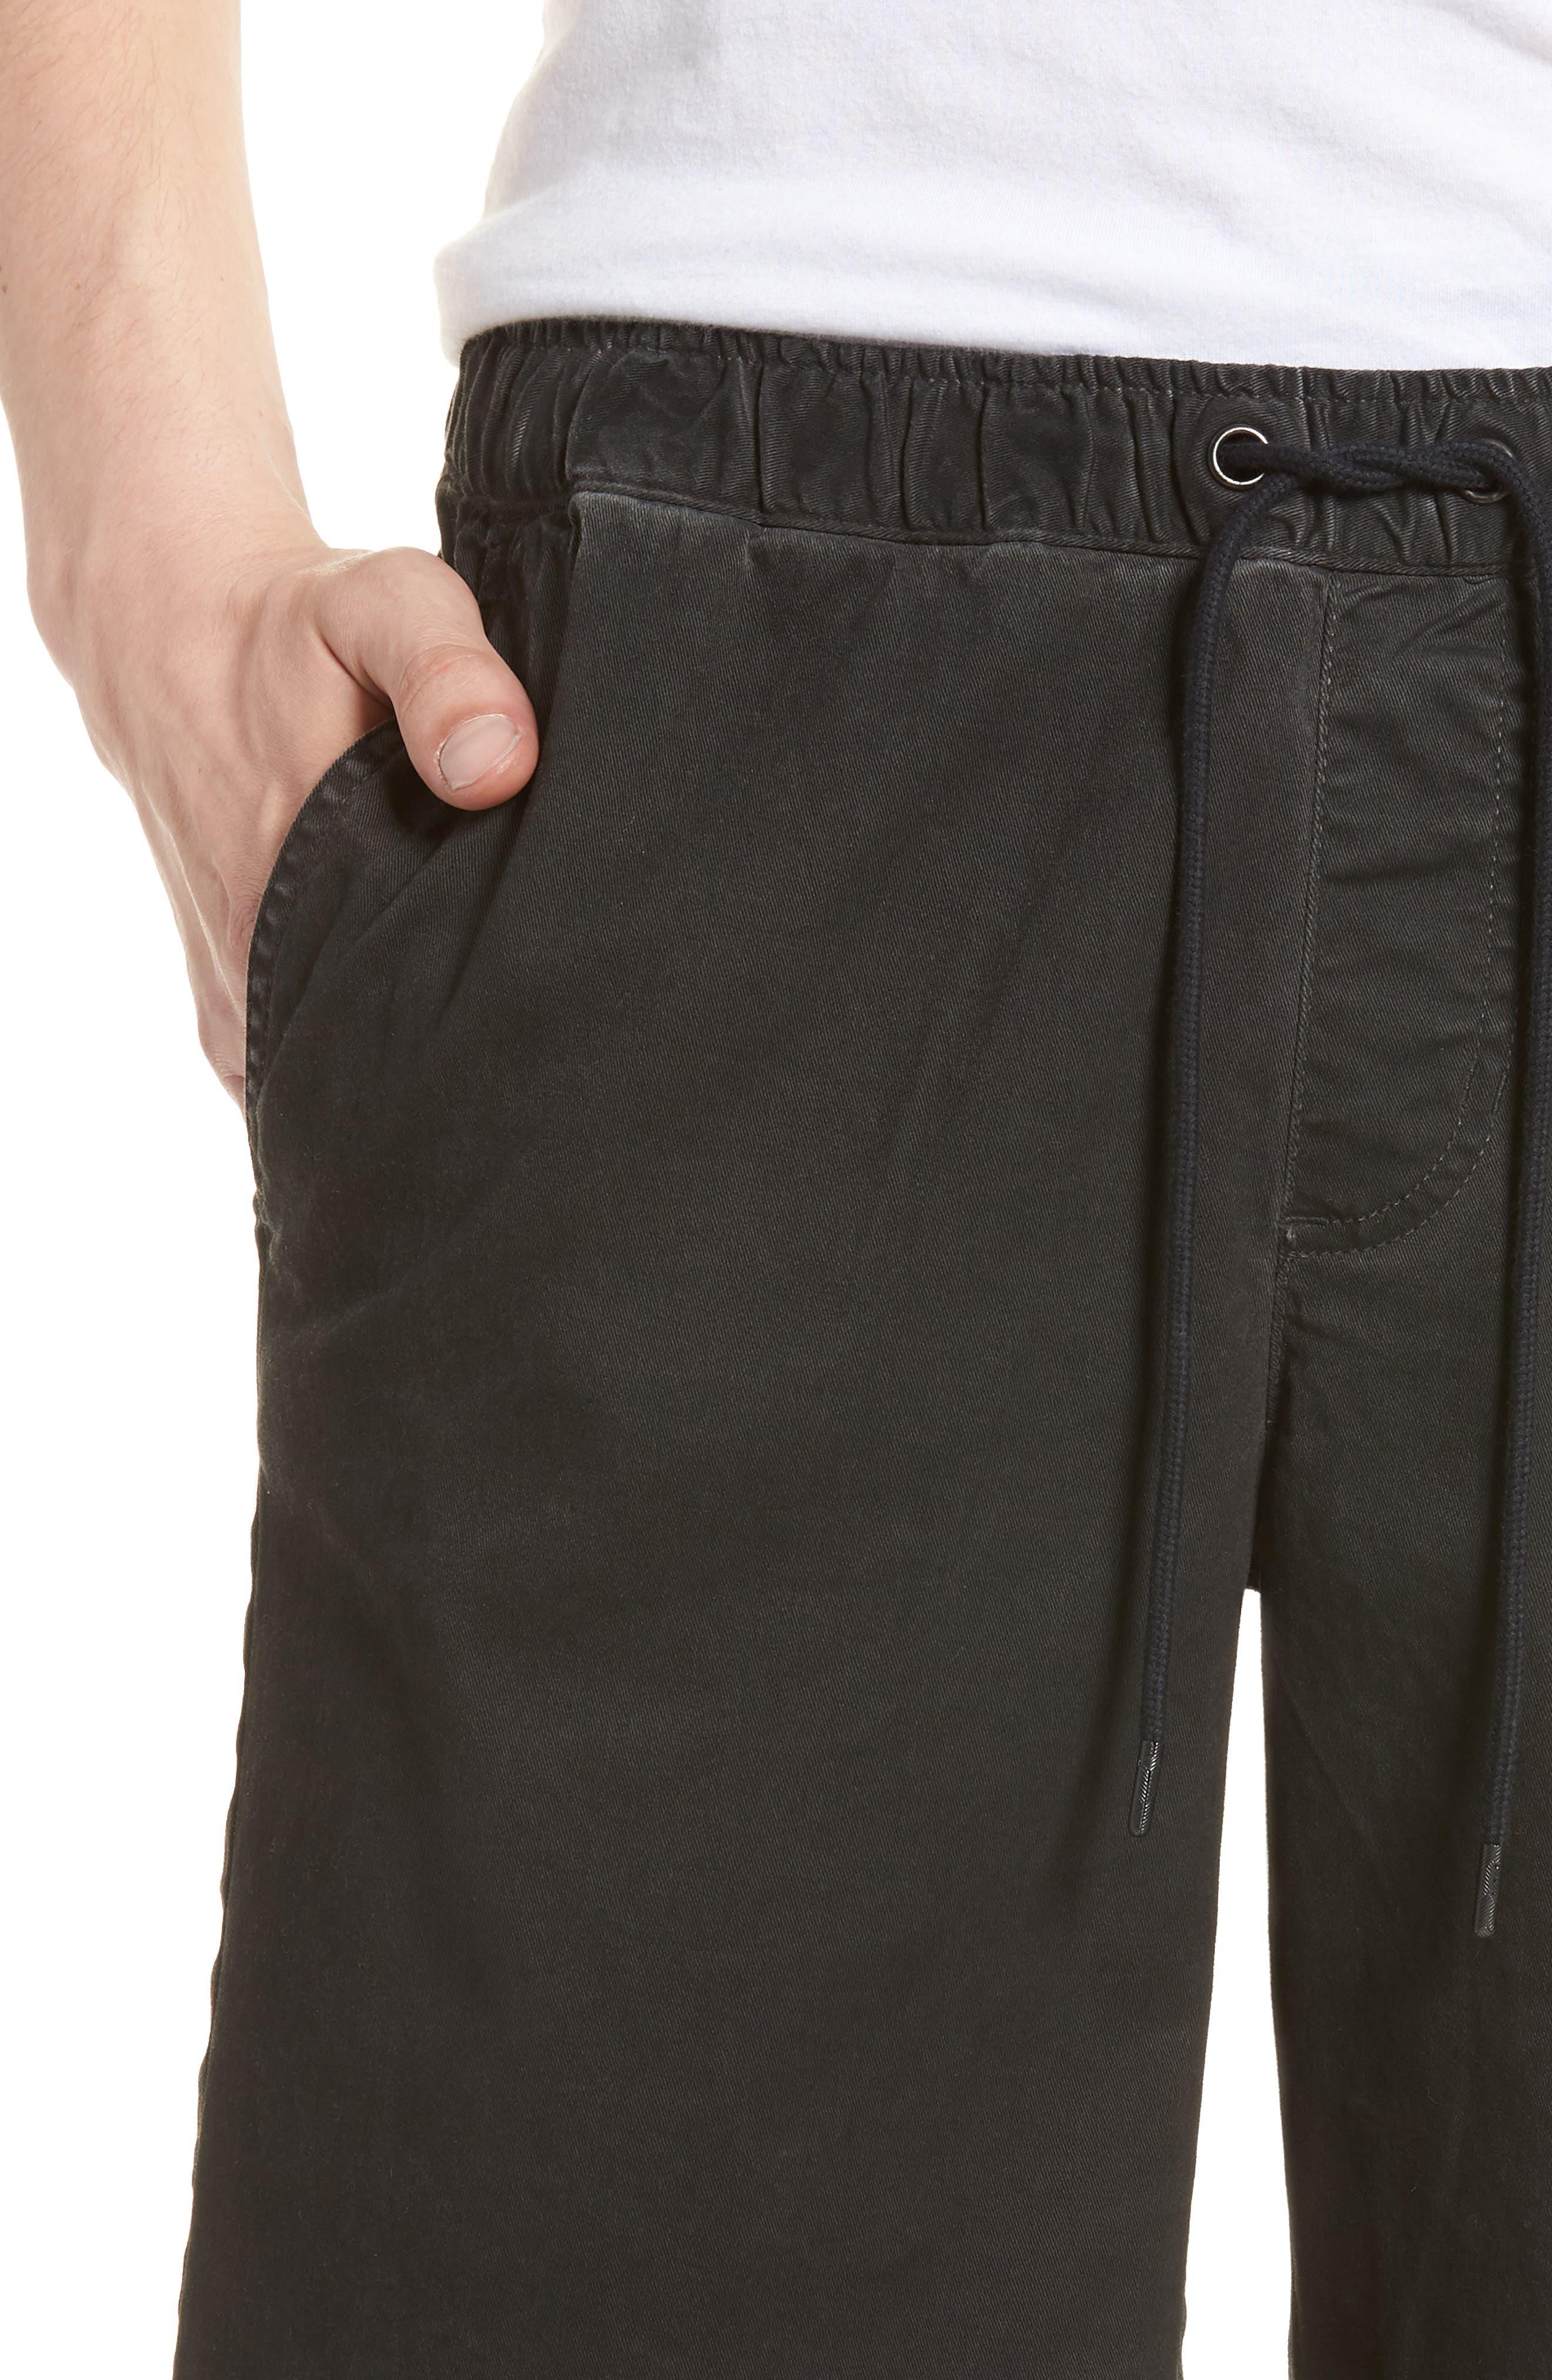 Pigment Dye Volley Shorts,                             Alternate thumbnail 4, color,                             Grey Onyx